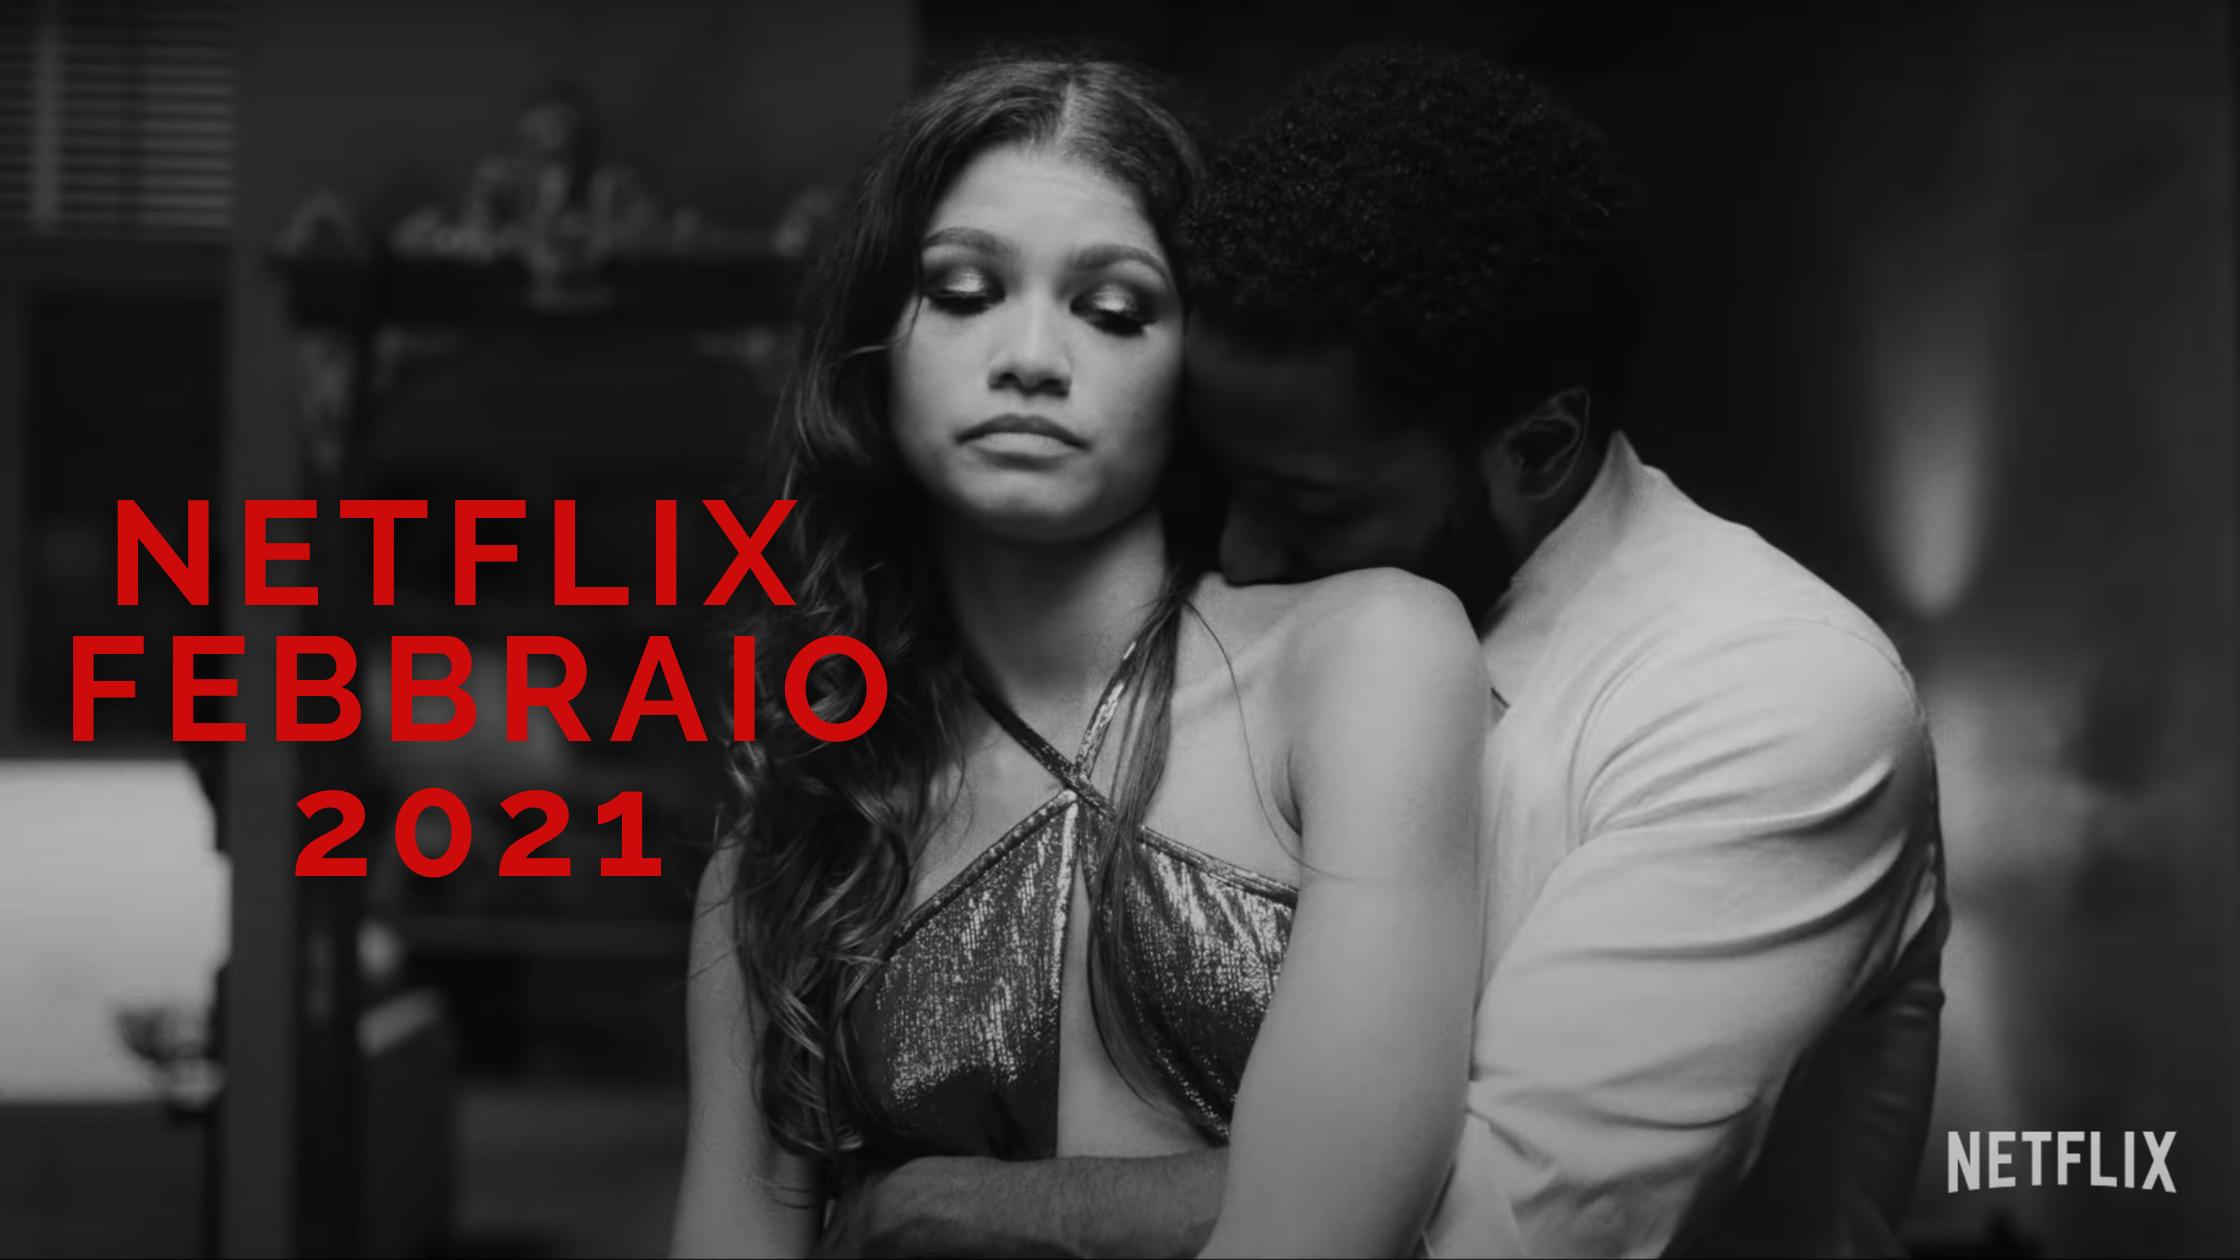 Netflix Febbraio 2021